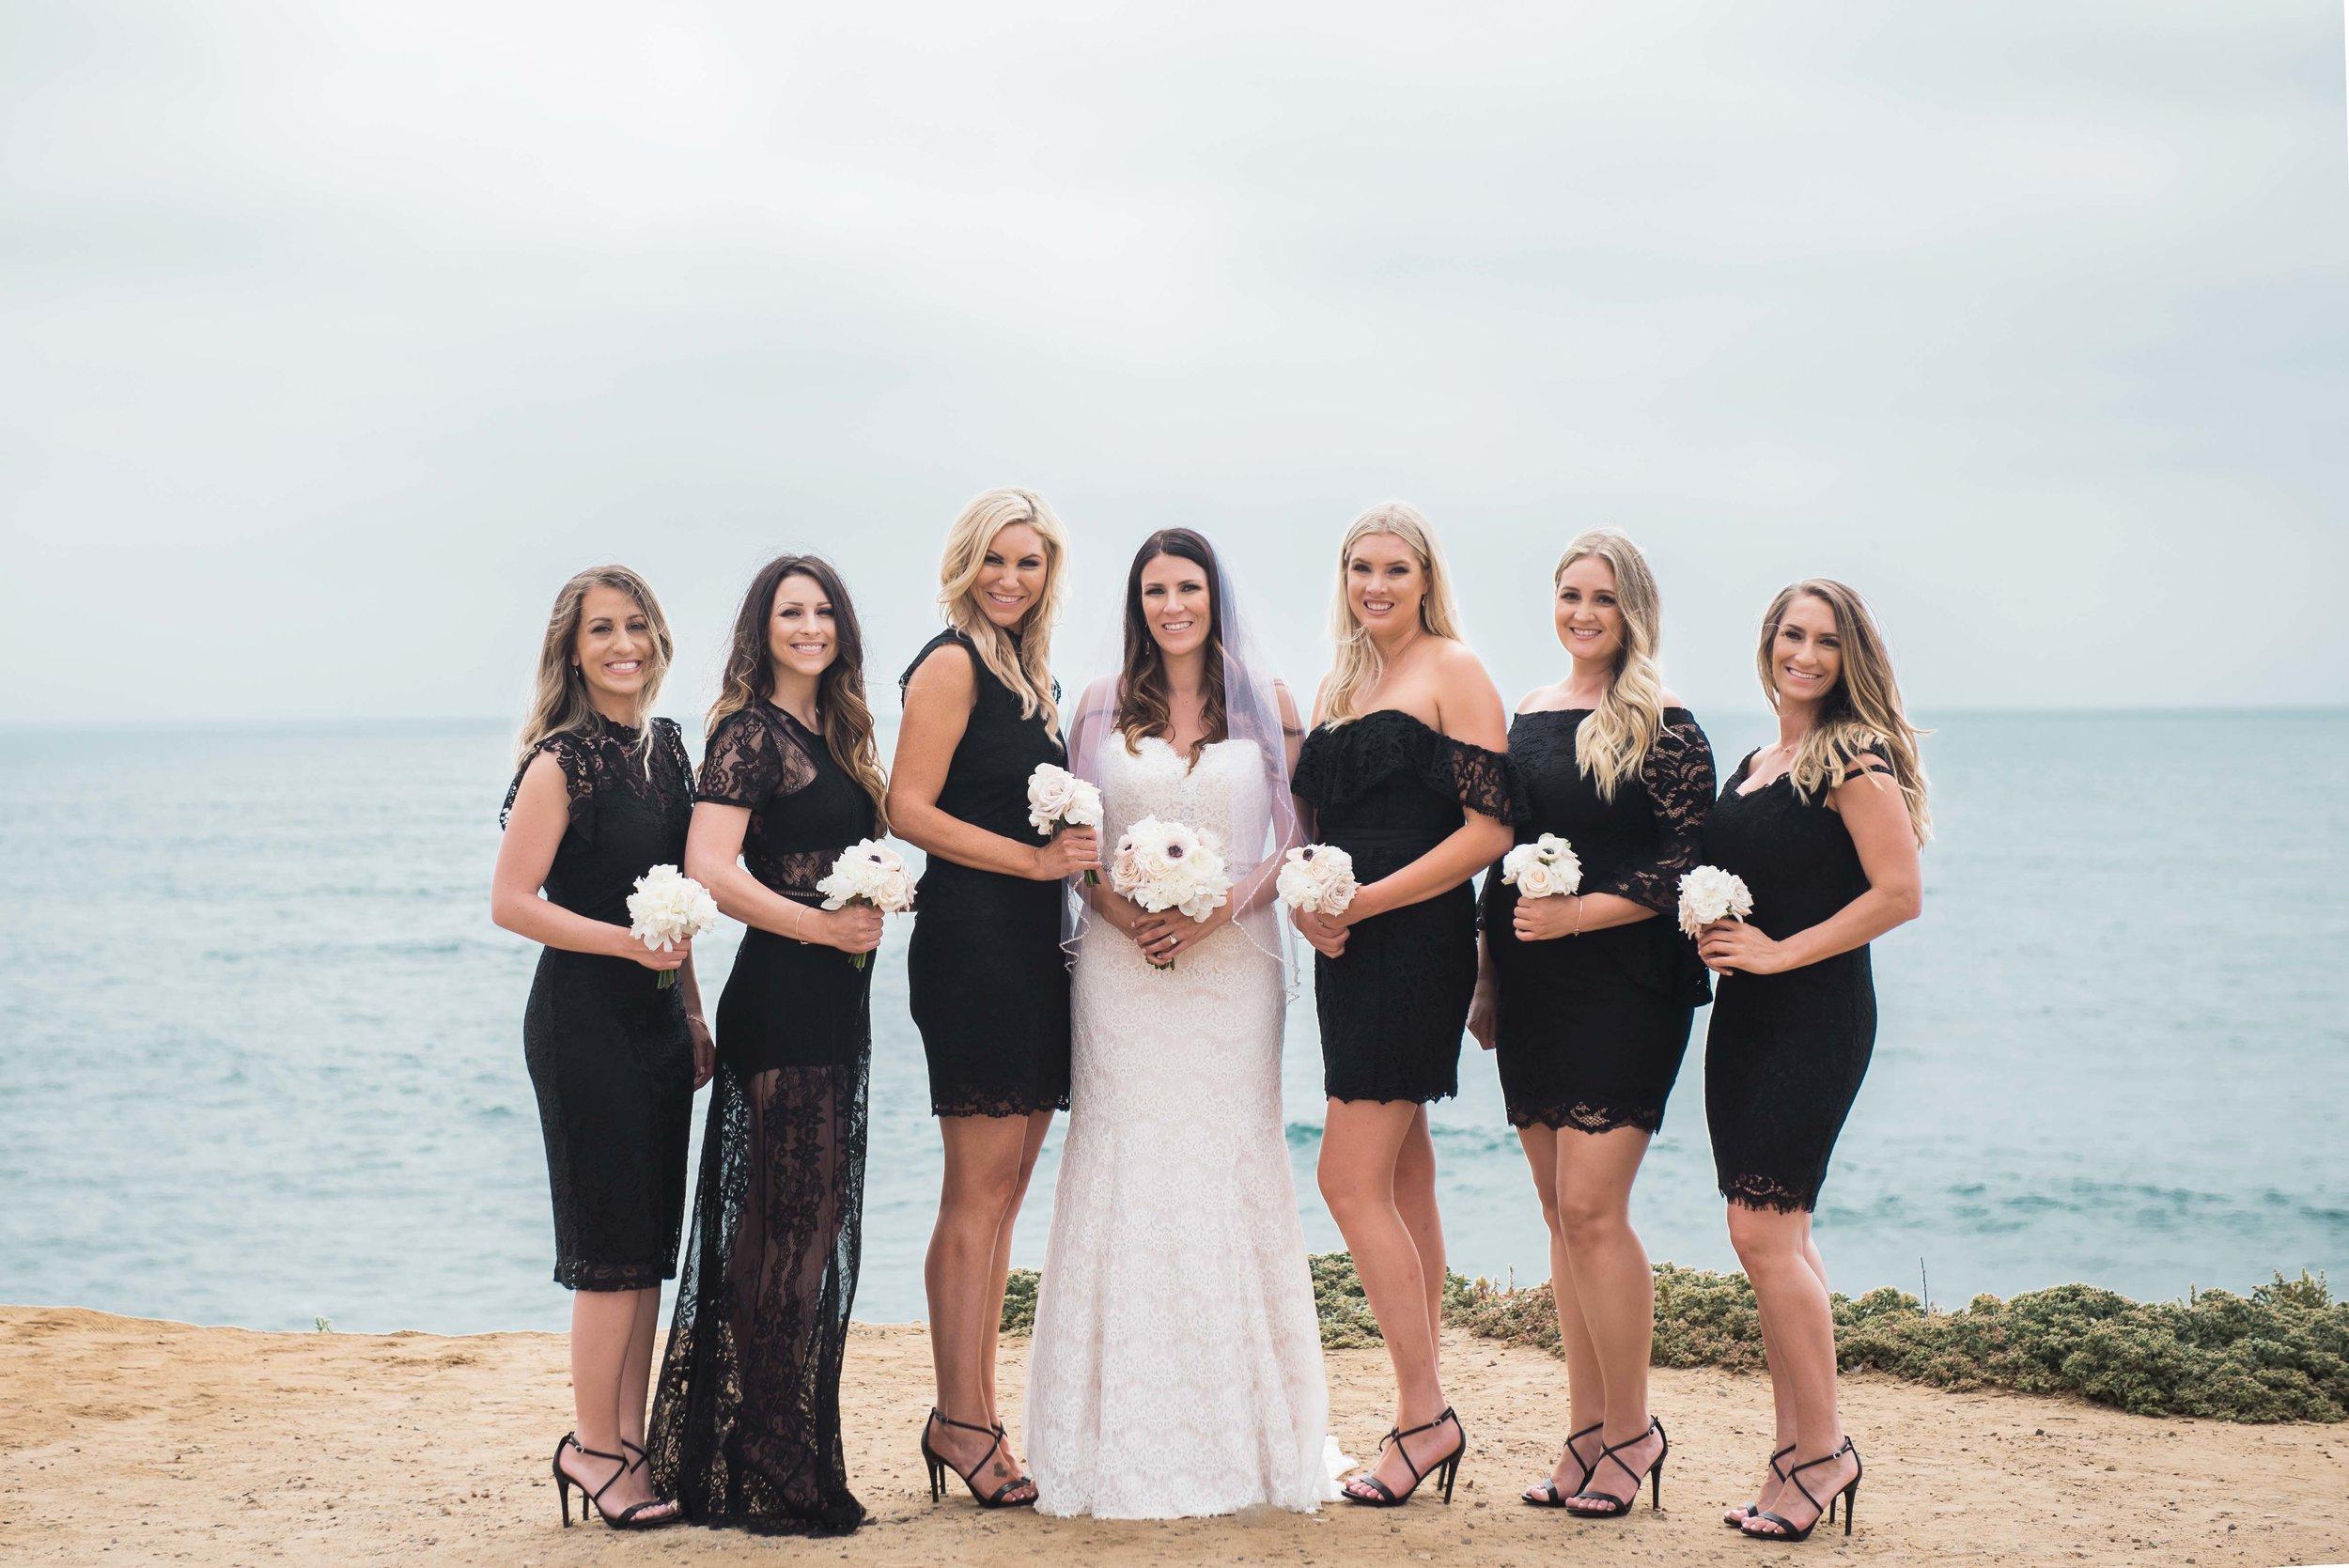 weddingwebsitesmallerpics-324.jpg